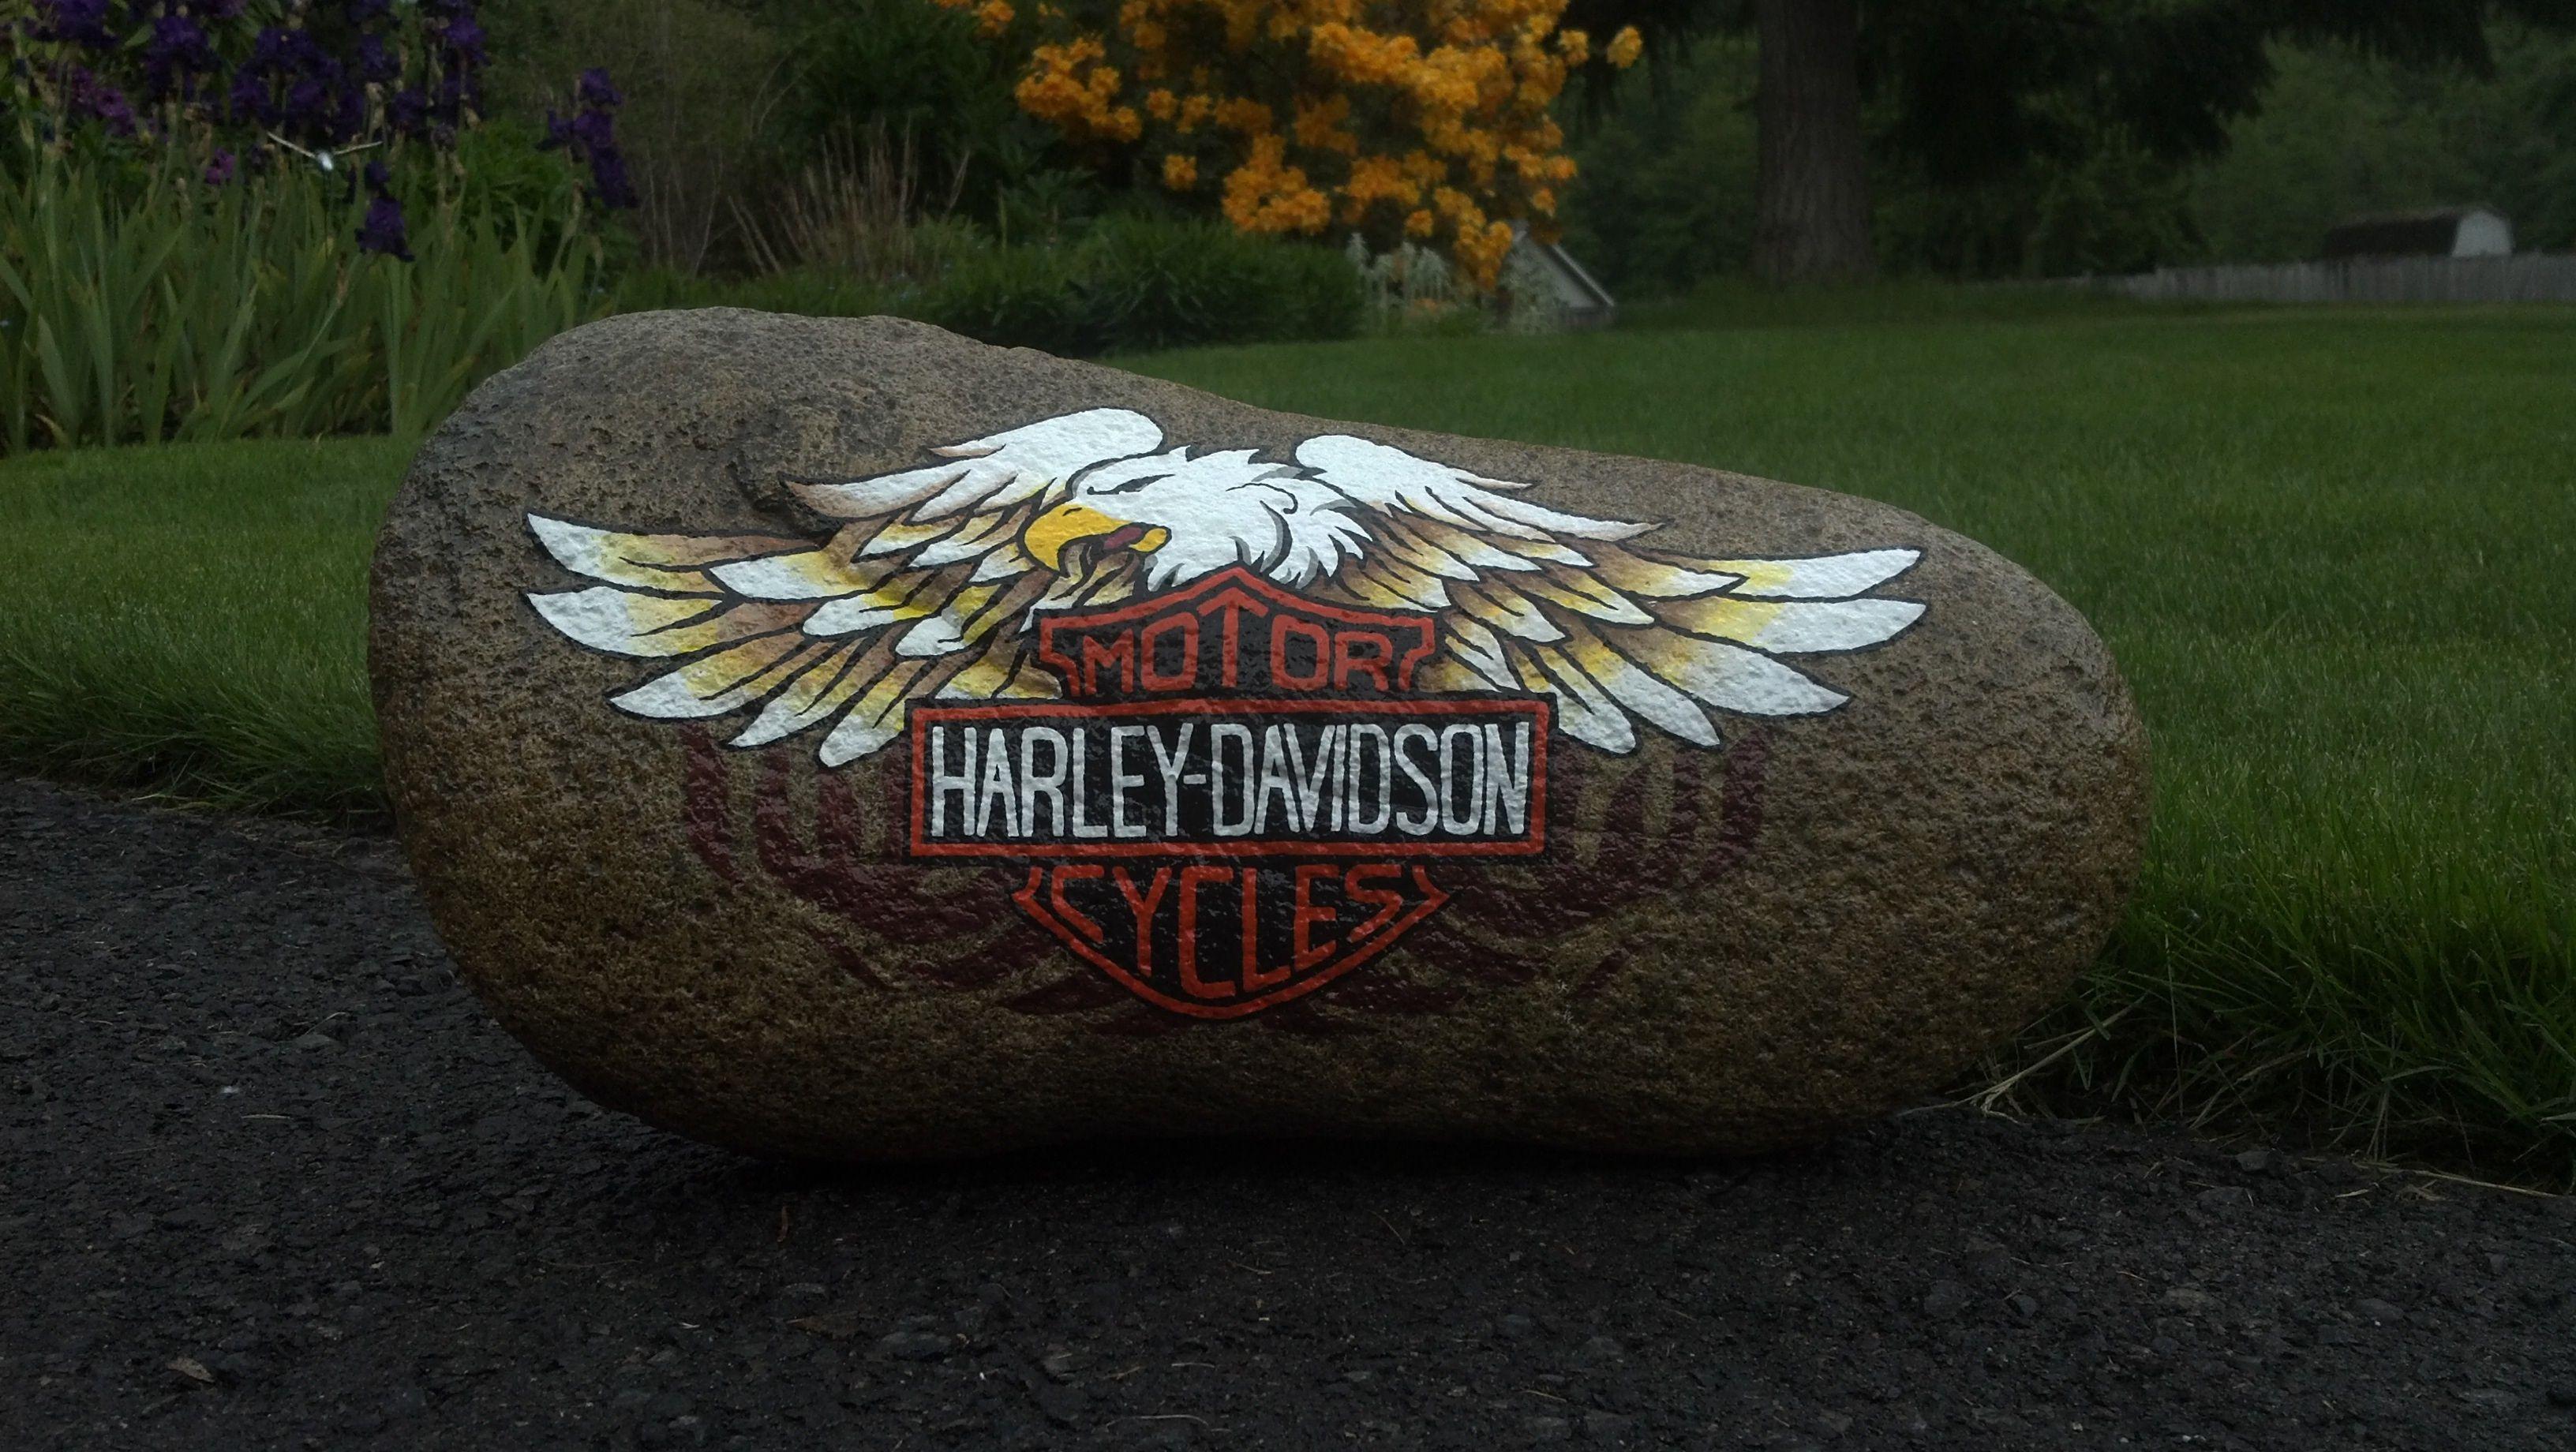 Harley painted garden rock rocks pinterest - Painting rocks for garden ...